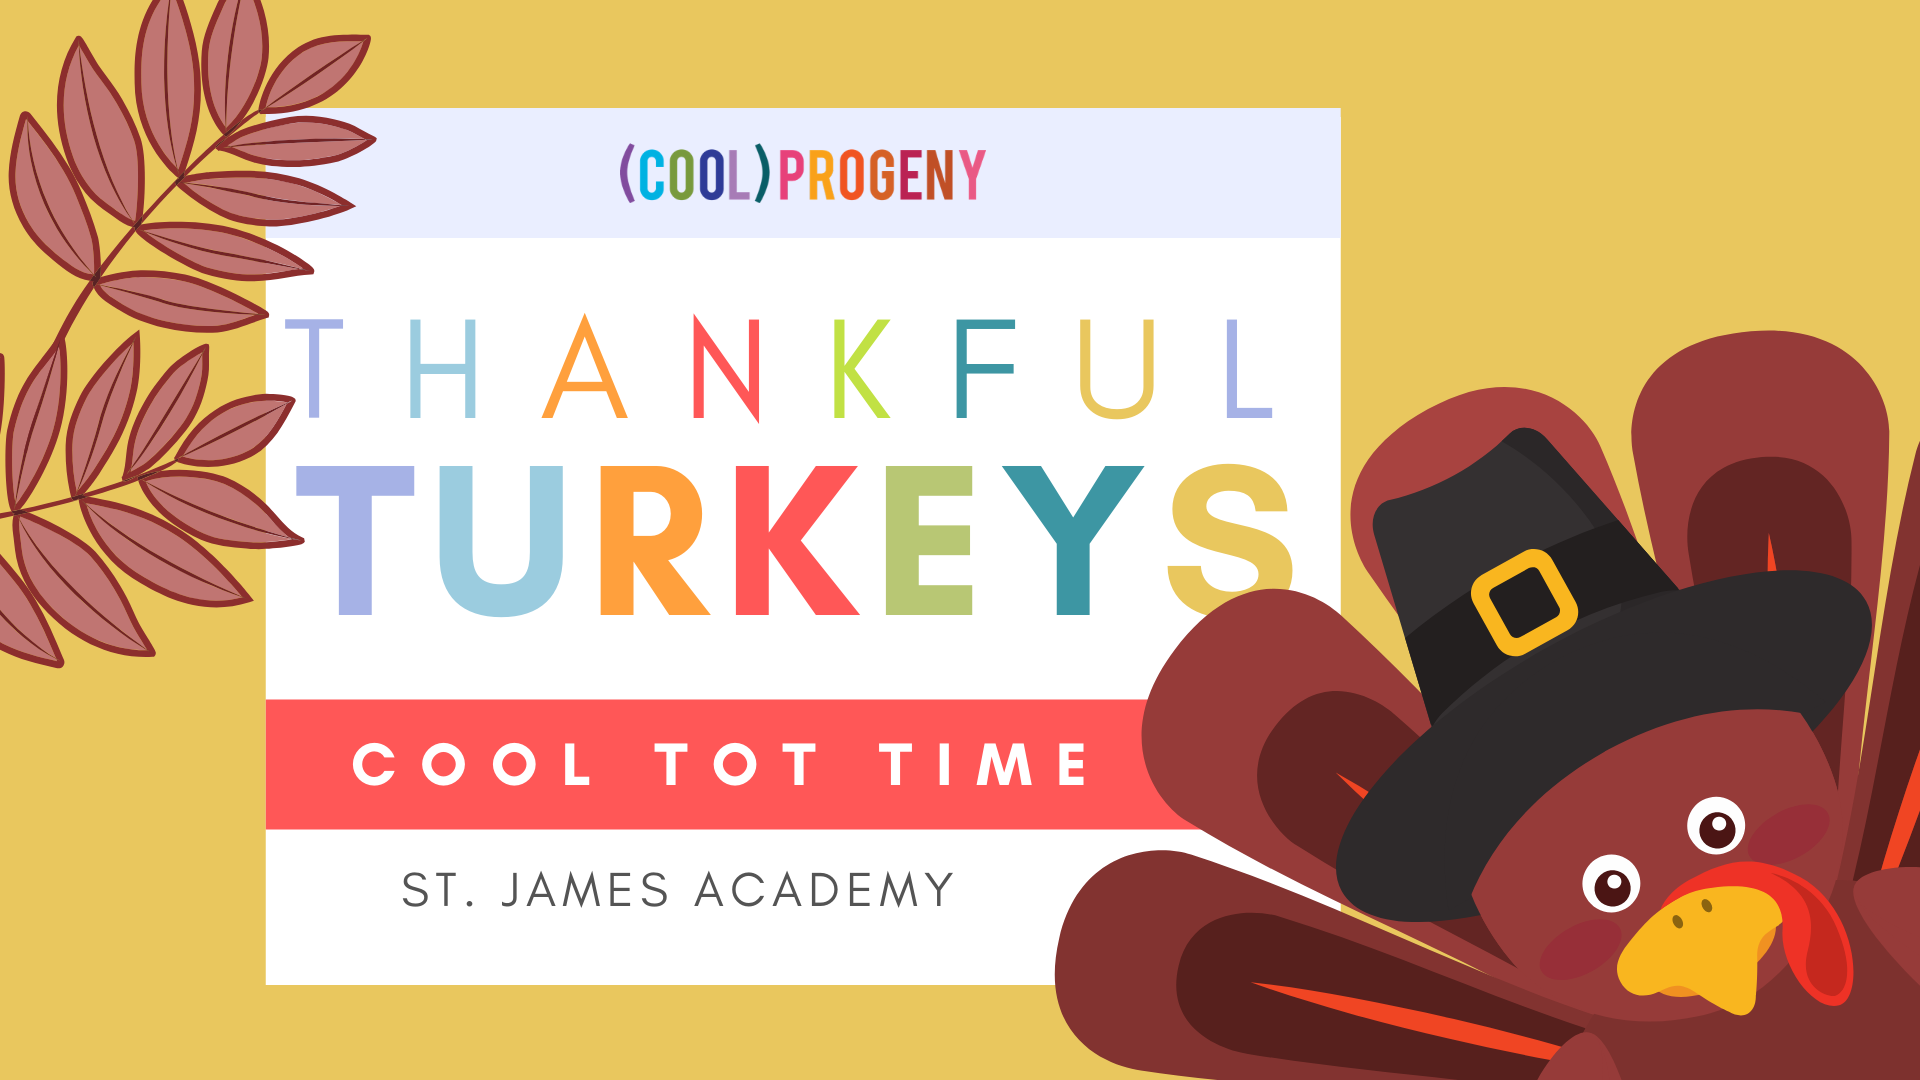 Cool Tot Time: Thankful Turkeys